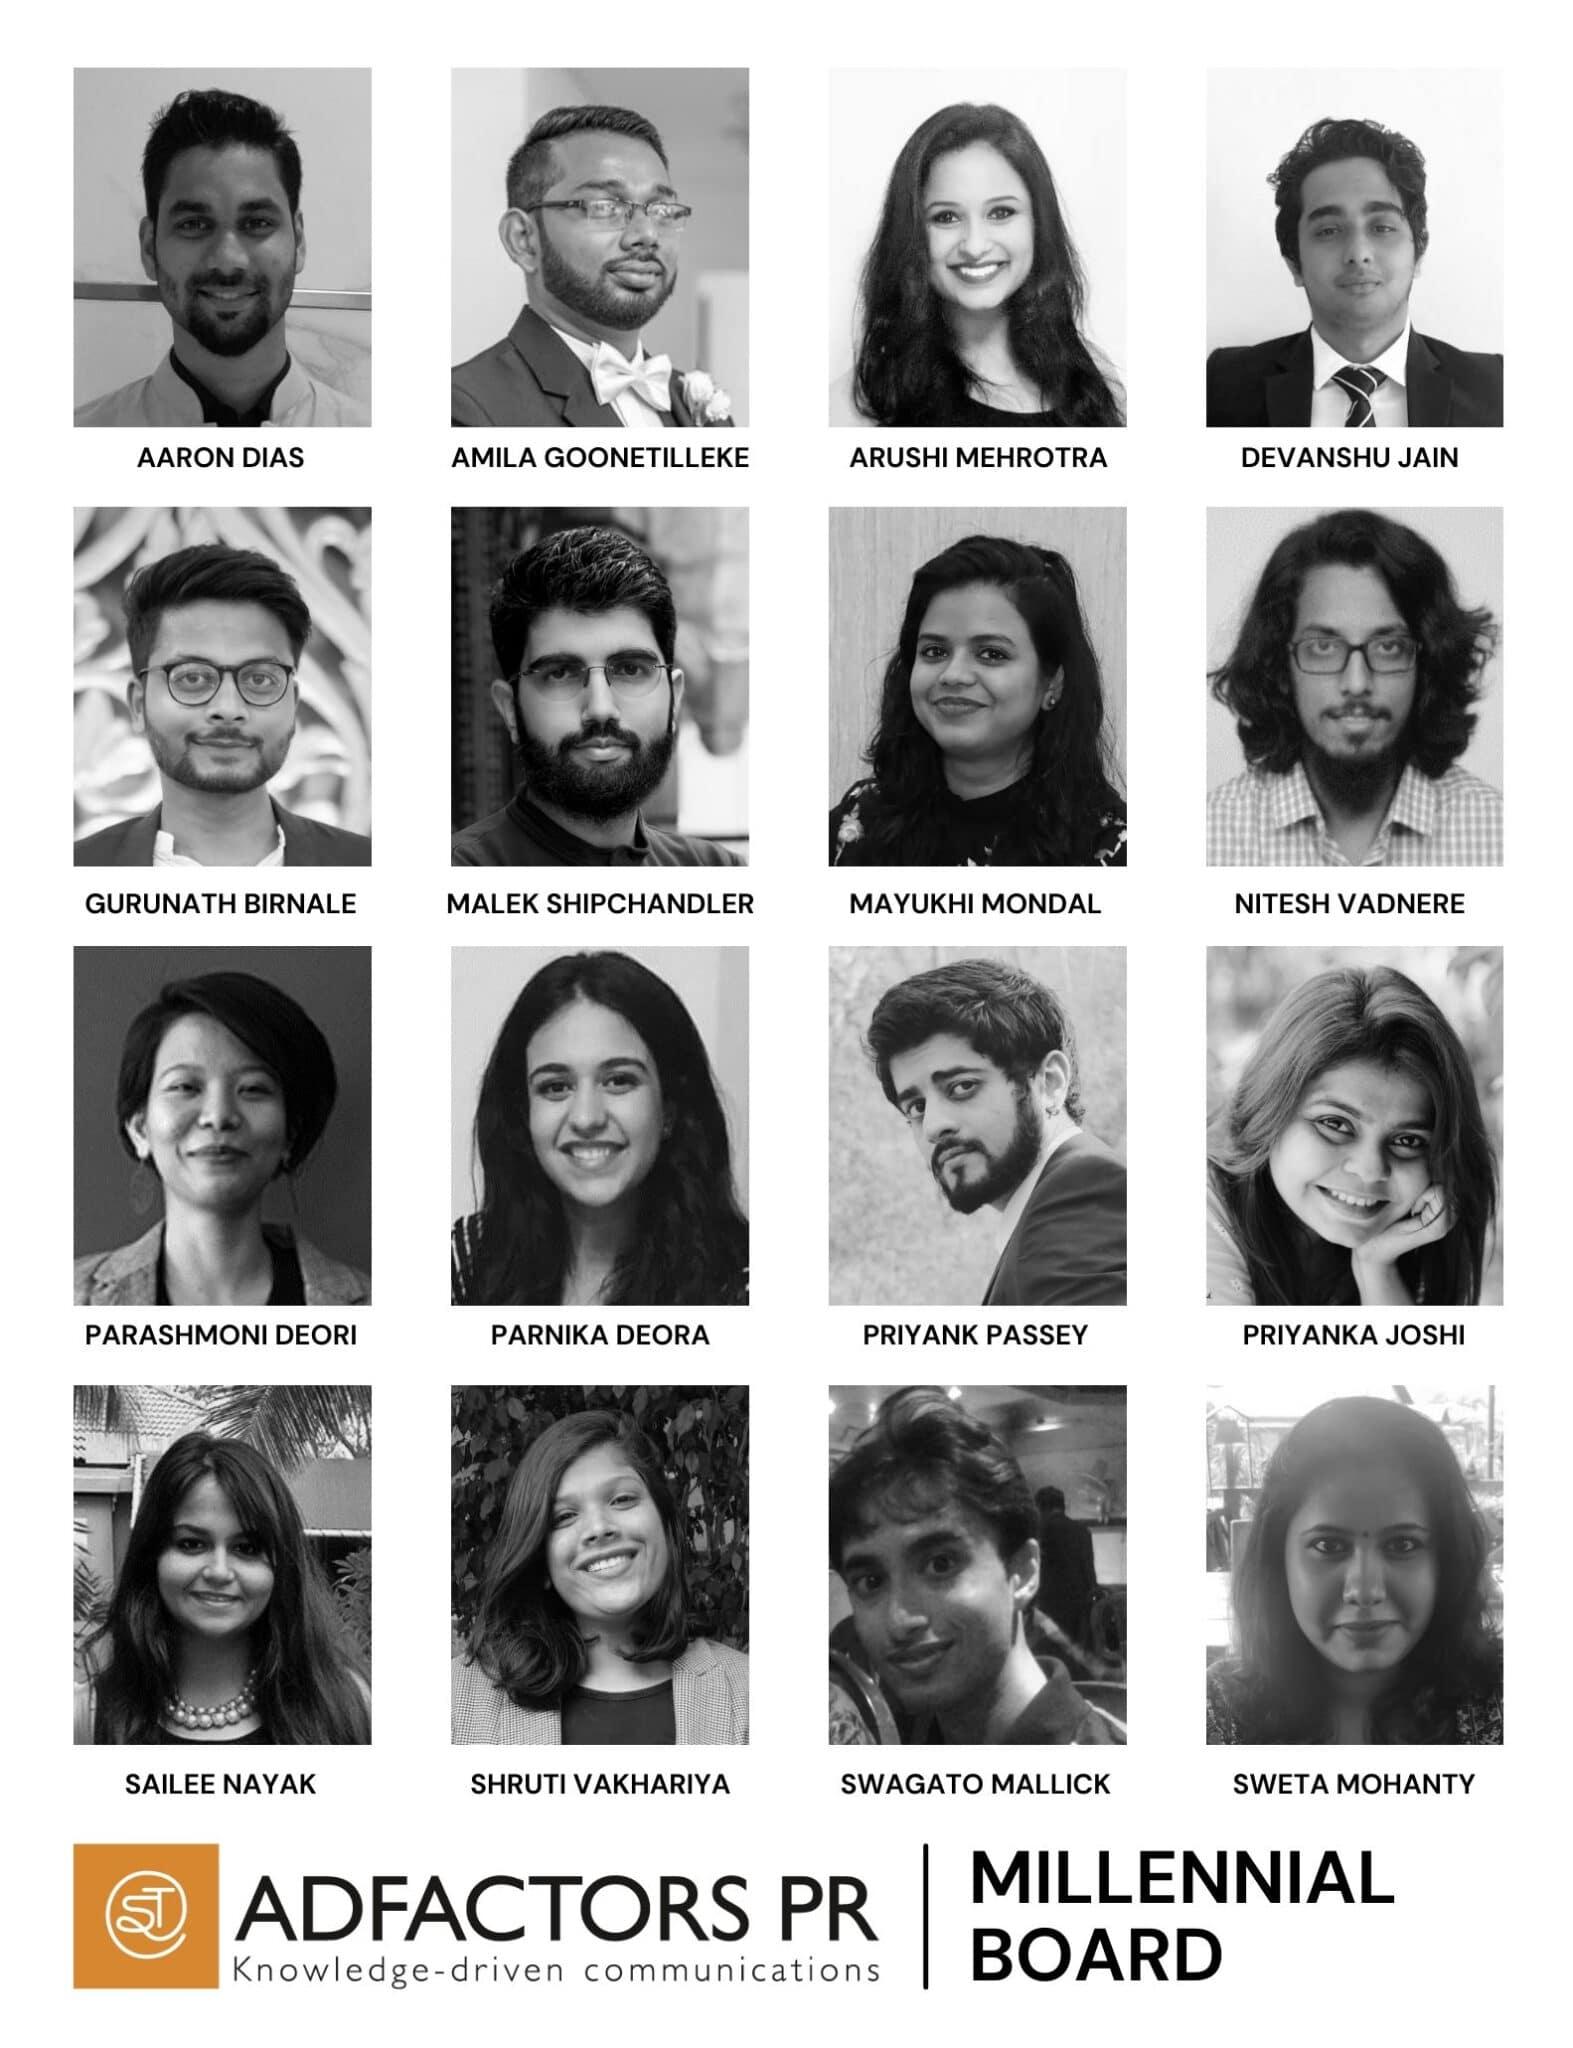 image-Adfactors PR Millennial Board Collage